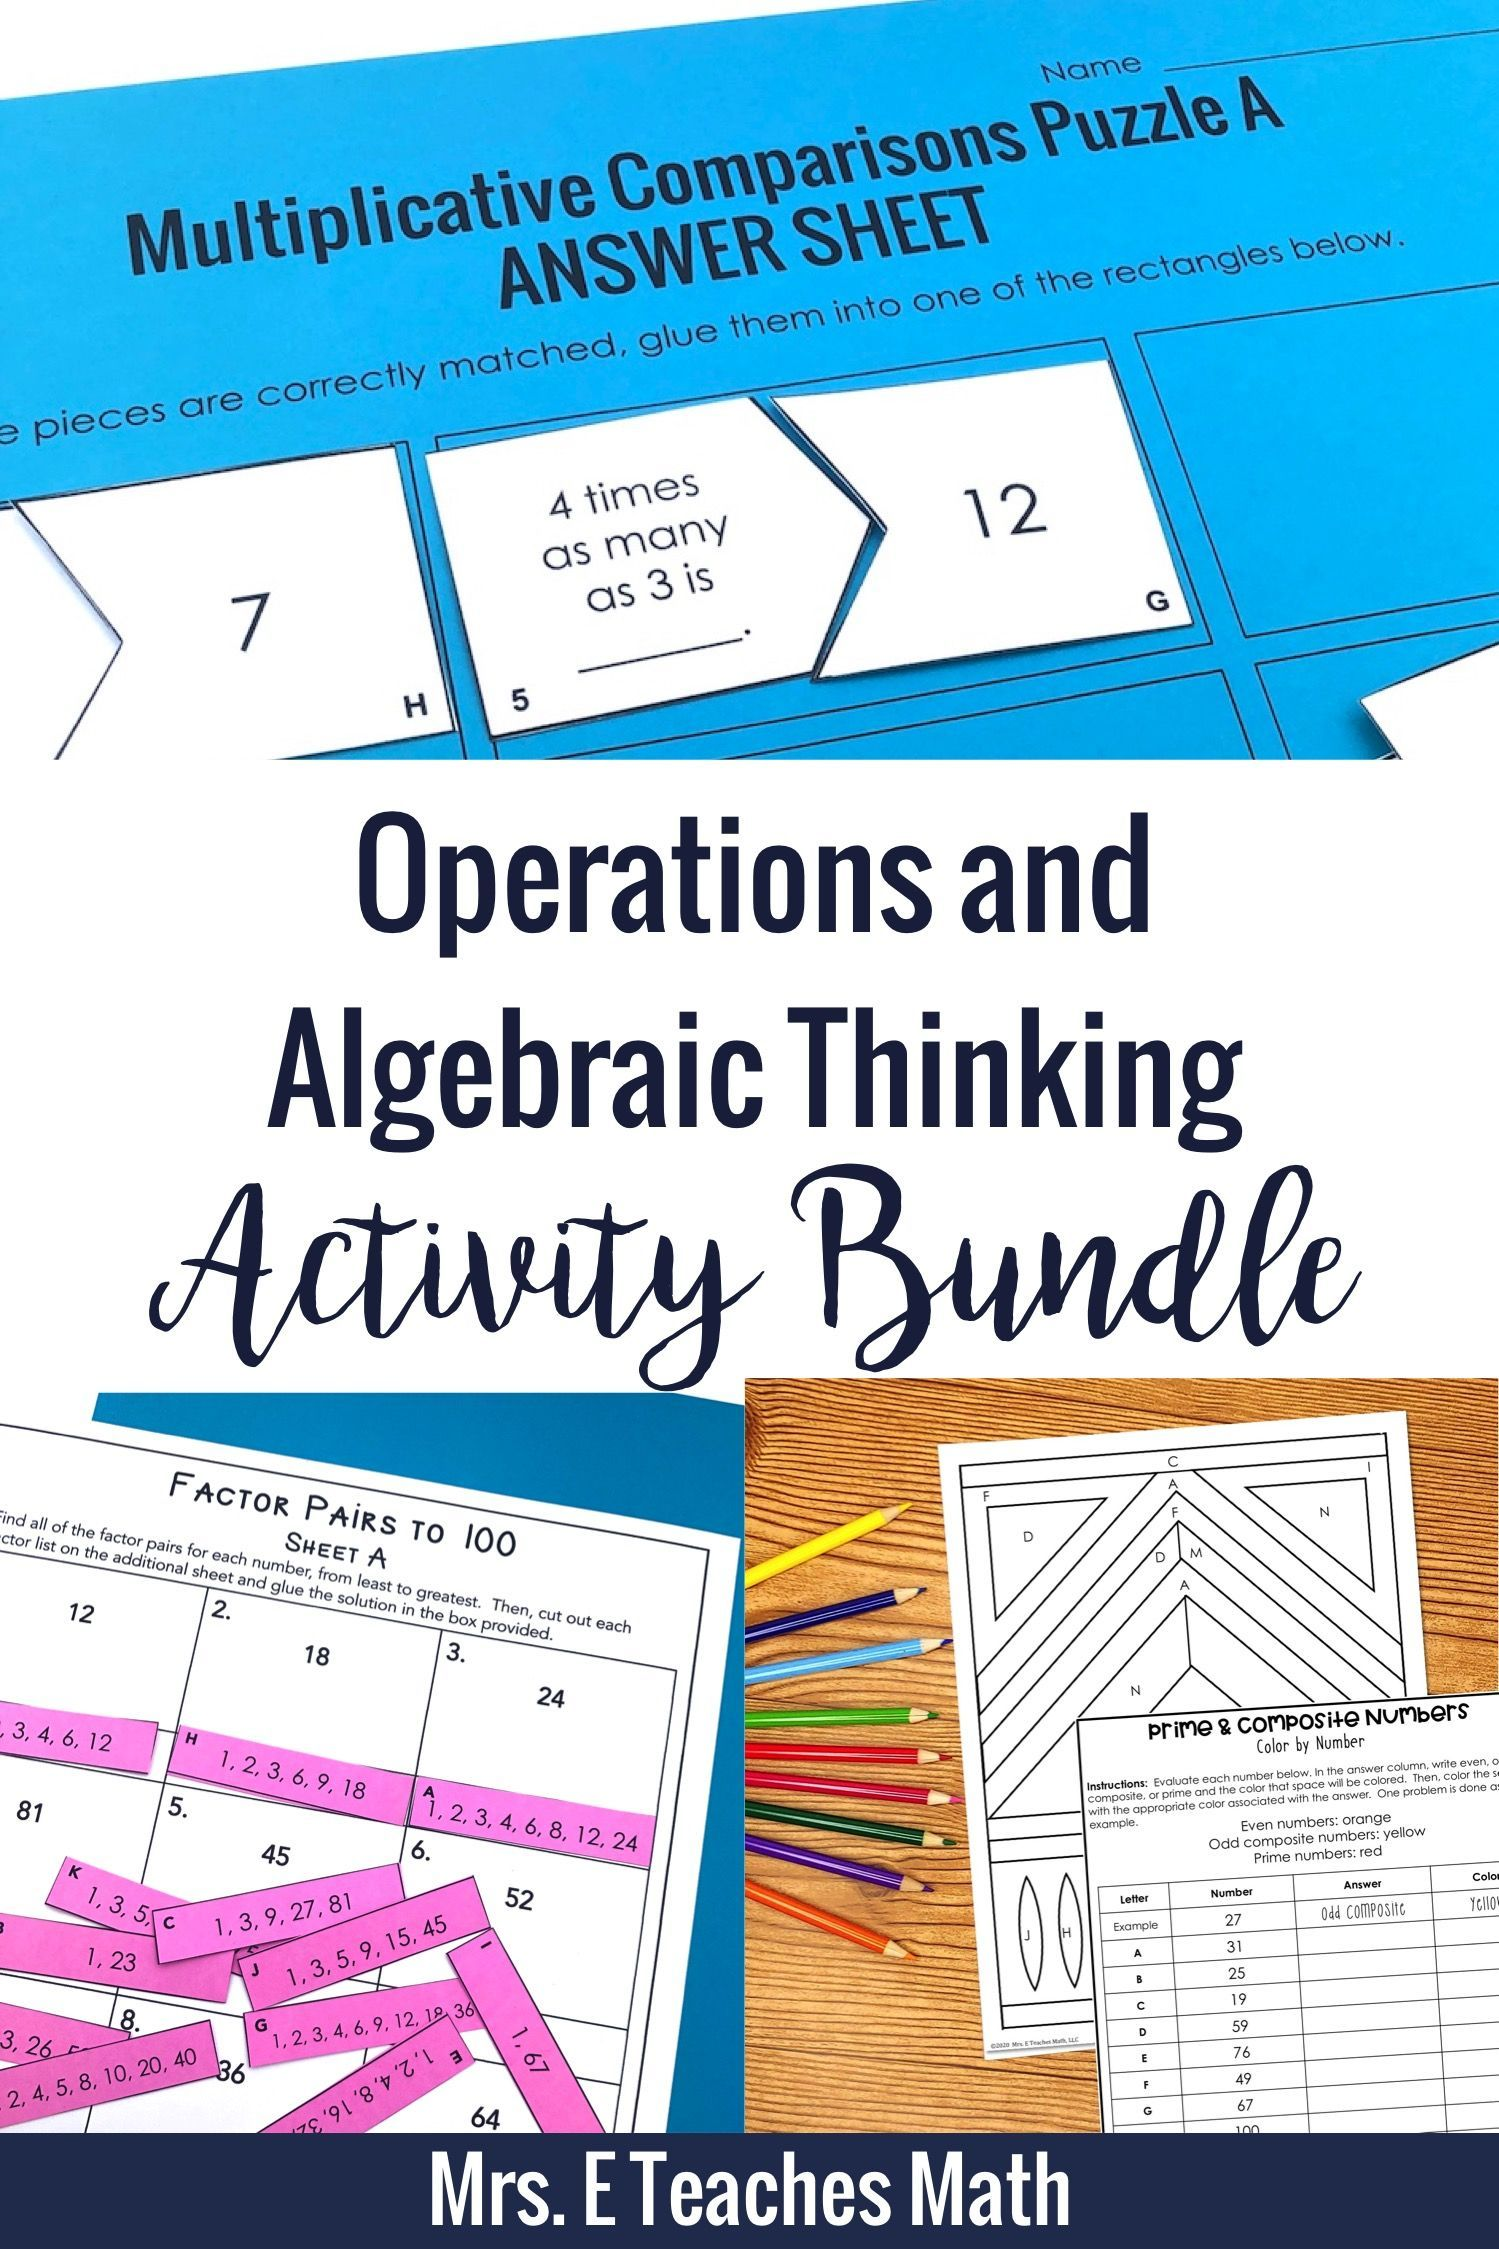 medium resolution of Operations and Algebraic Thinking Activity Bundle 4.OA   Algebraic thinking